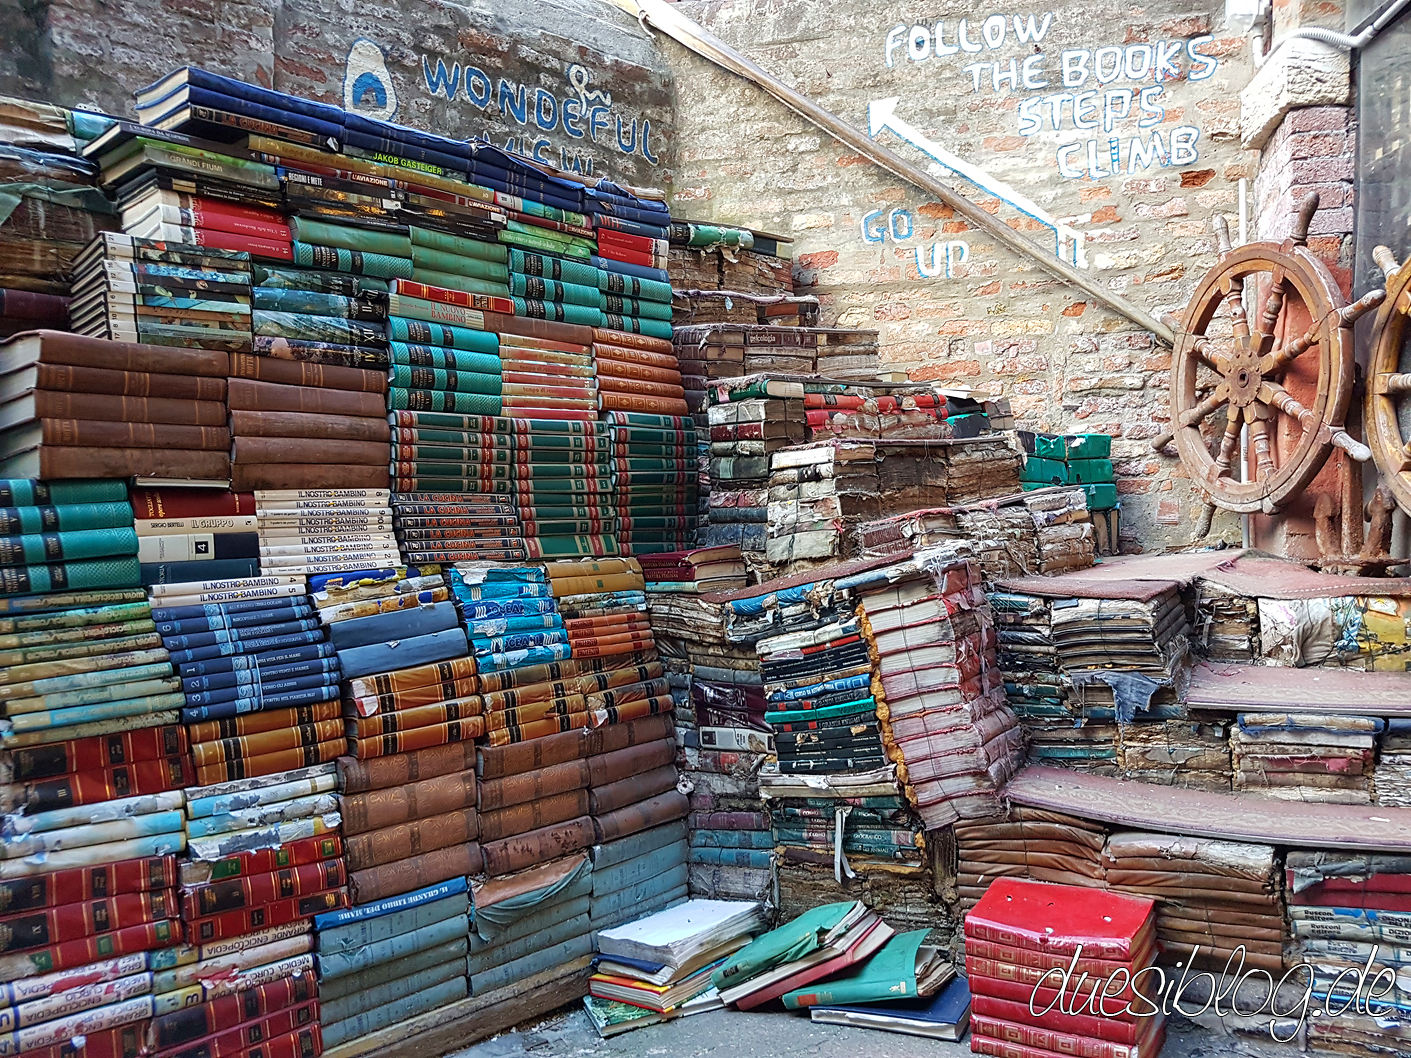 Venice Libreria Aqua Alta travelblog duesiblog 36